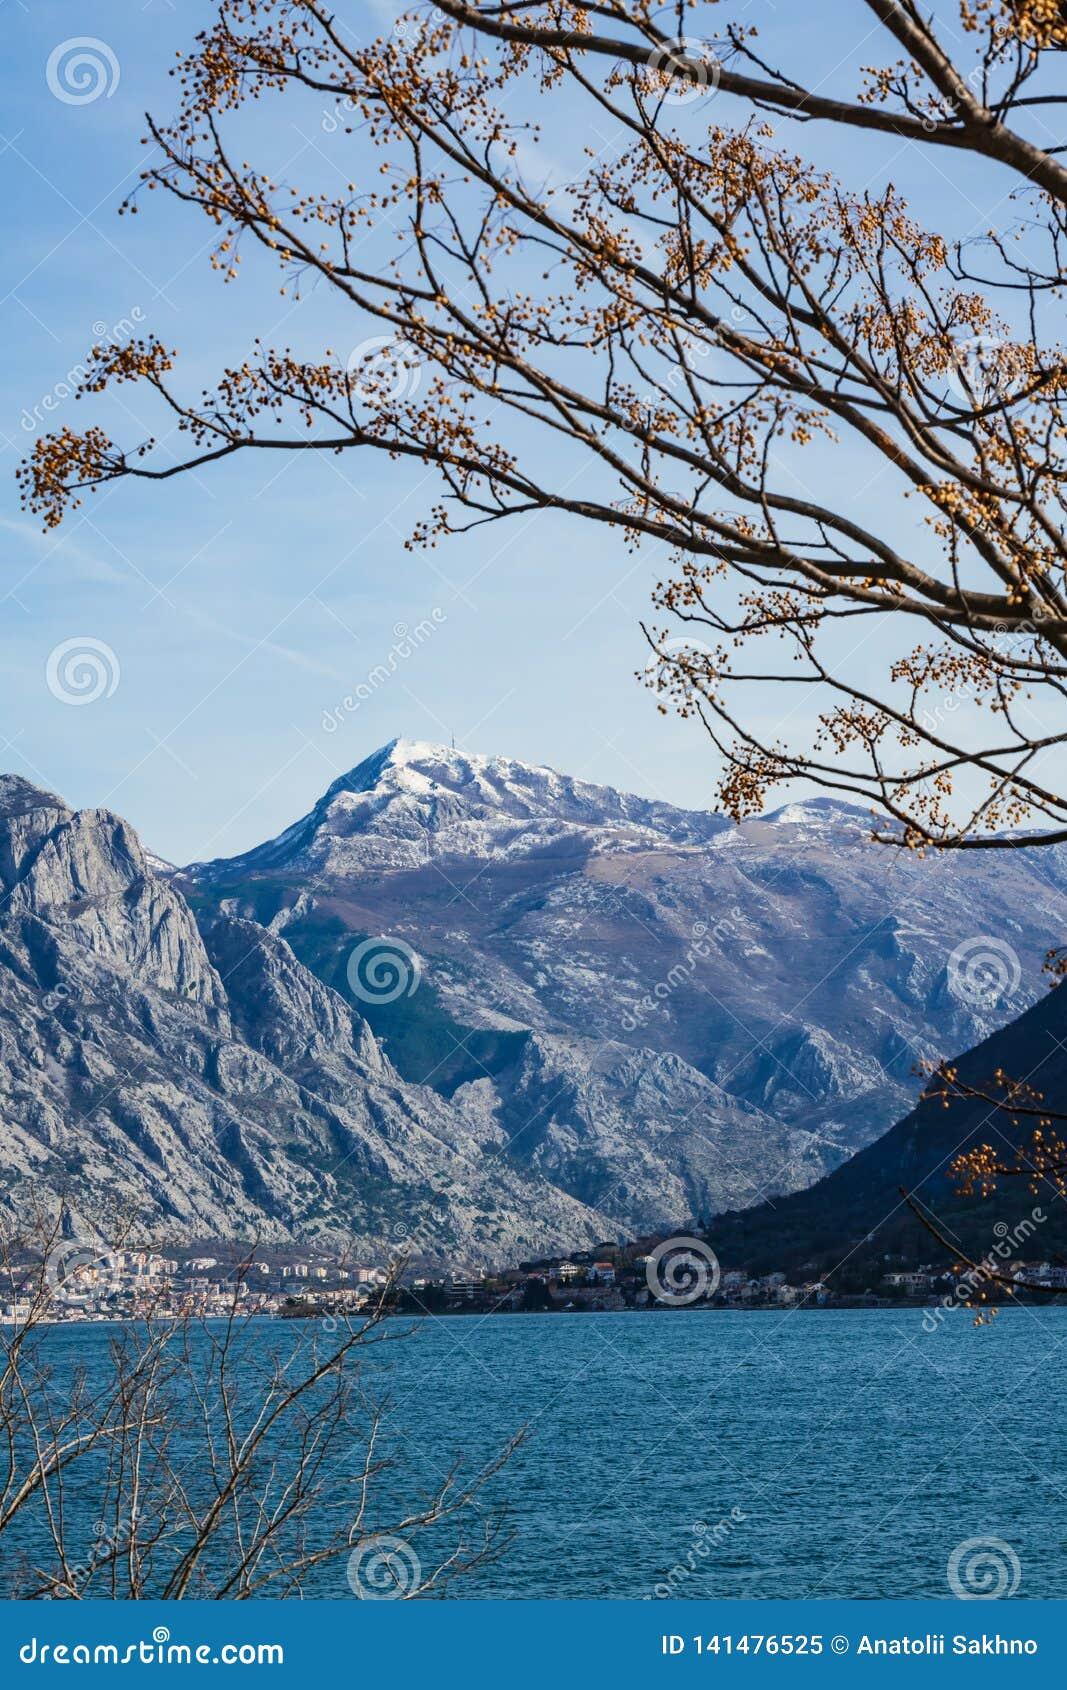 View of the snowy peak Lovcen in Montenegro